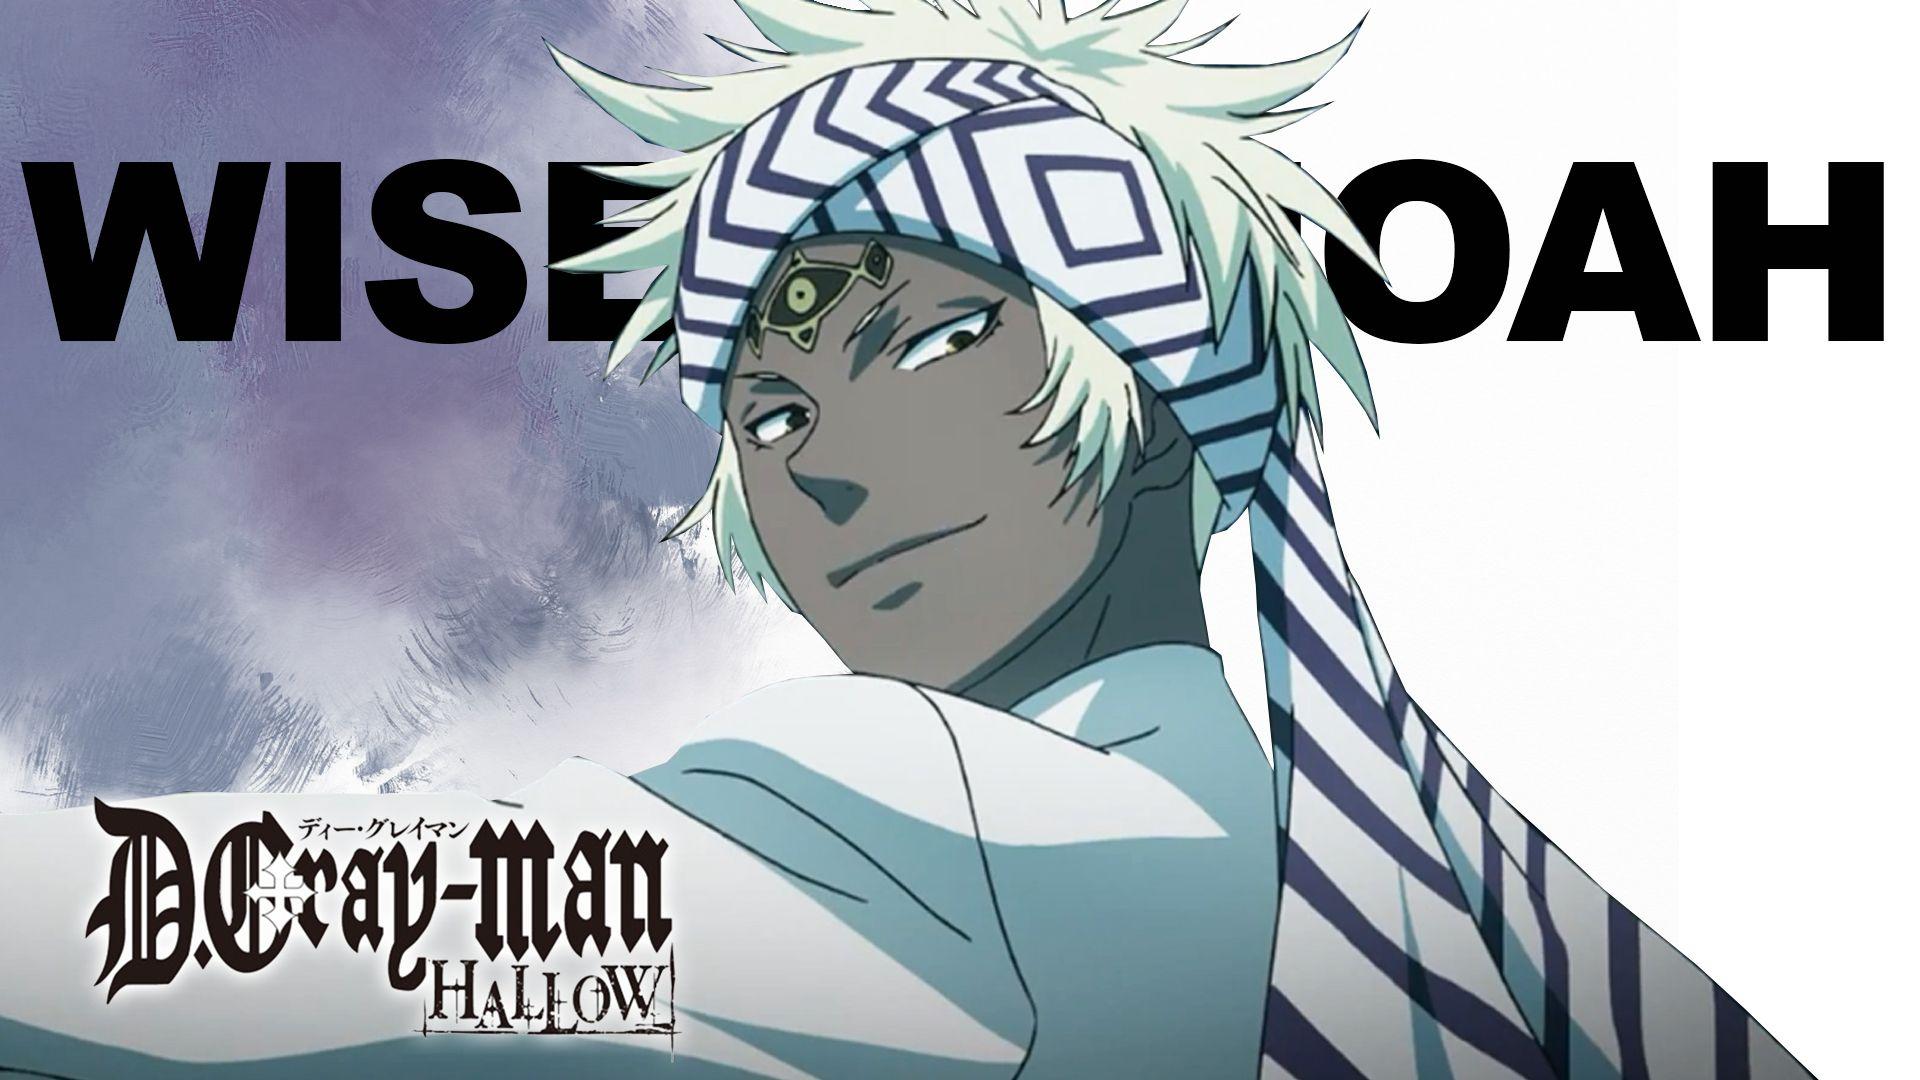 noah wisely anime d gray man hallow wallpaper hd | naruto